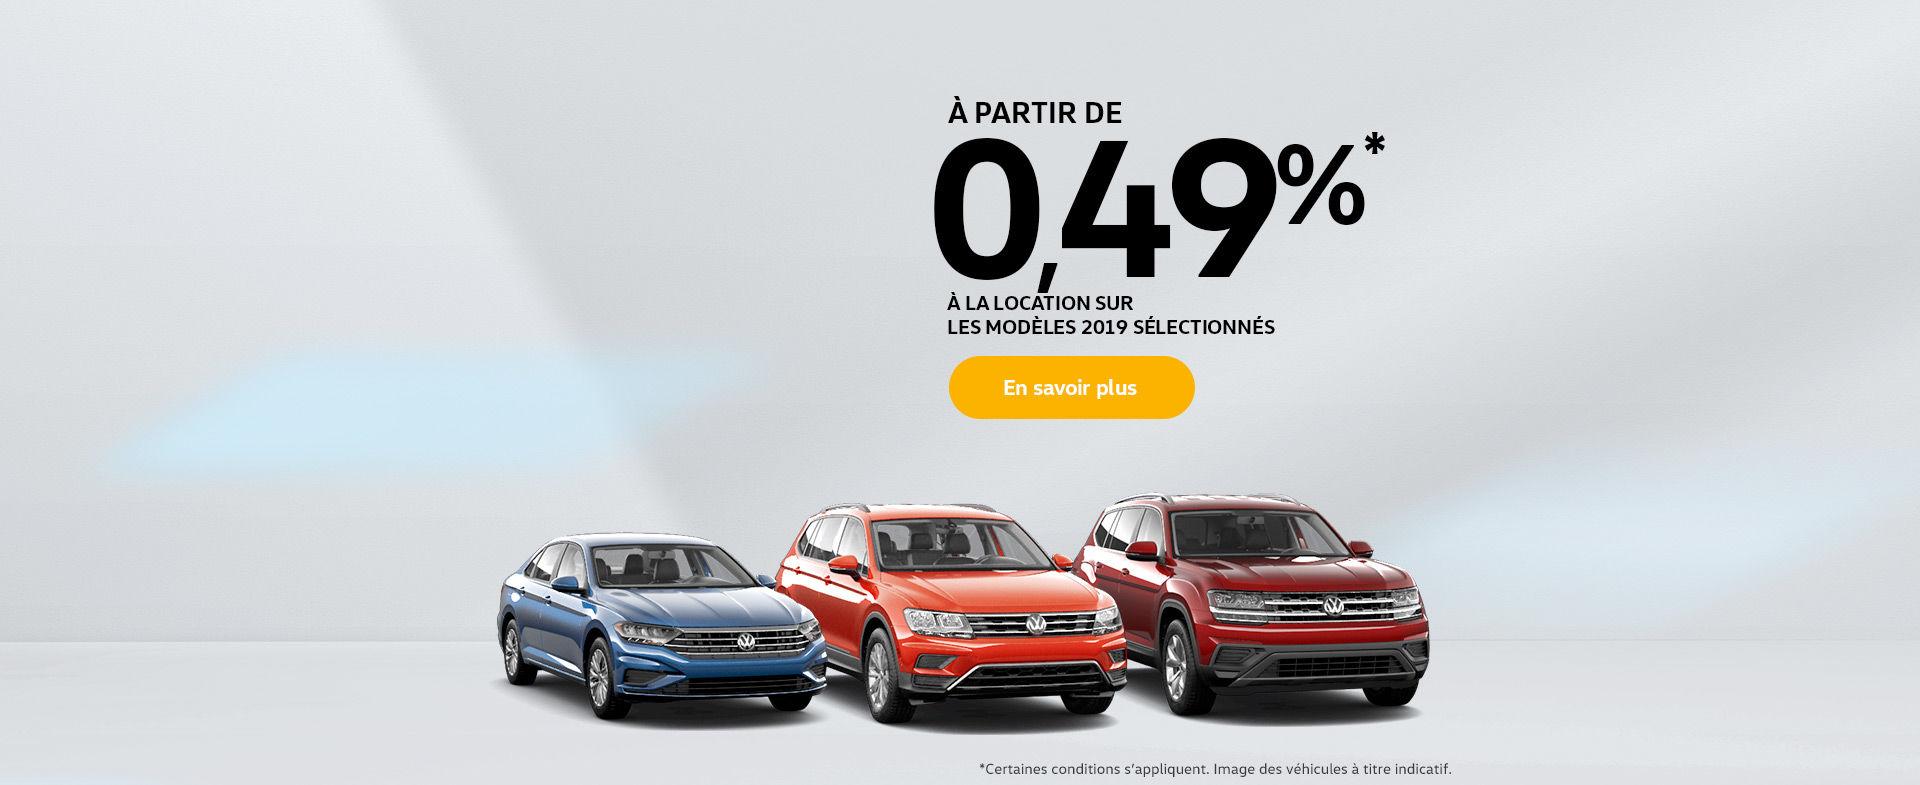 L'événement mensuel Volkswagen!